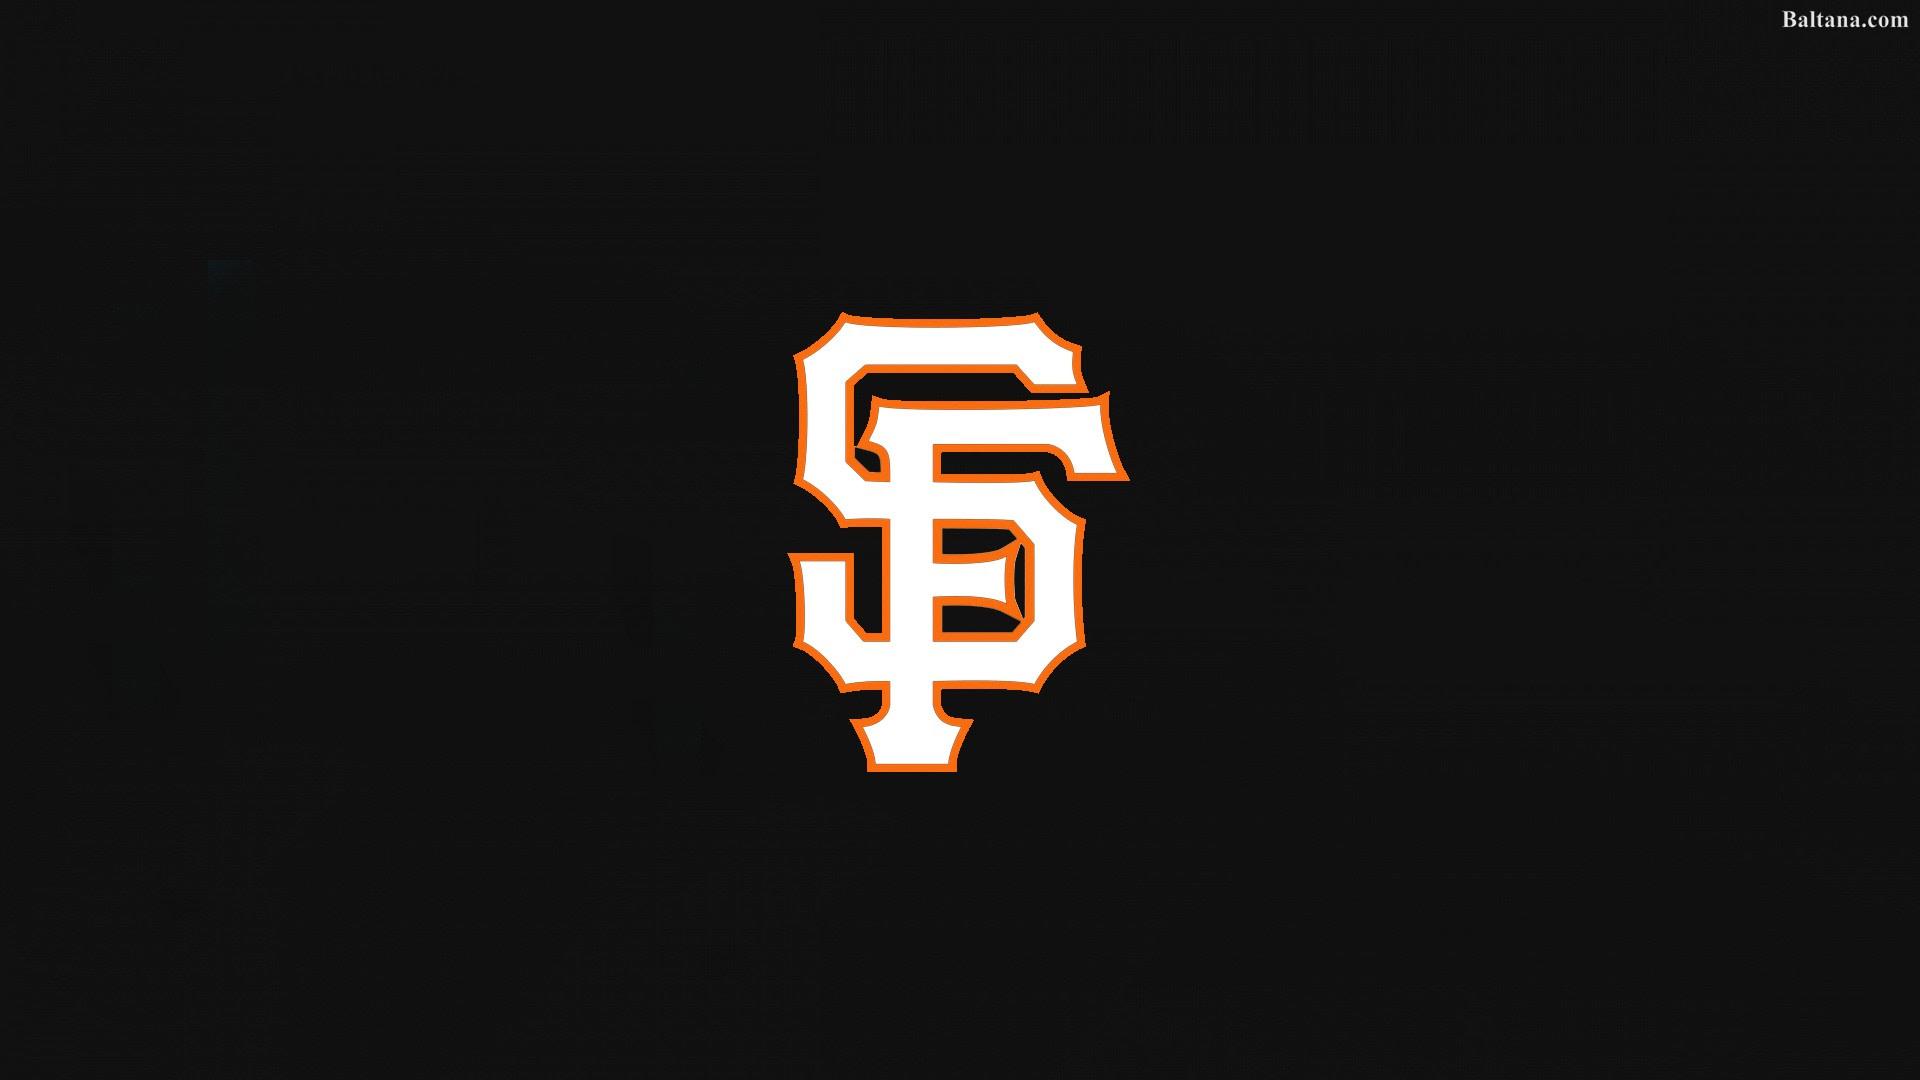 San Francisco Giants Desktop Wallpaper 33291 Baltana